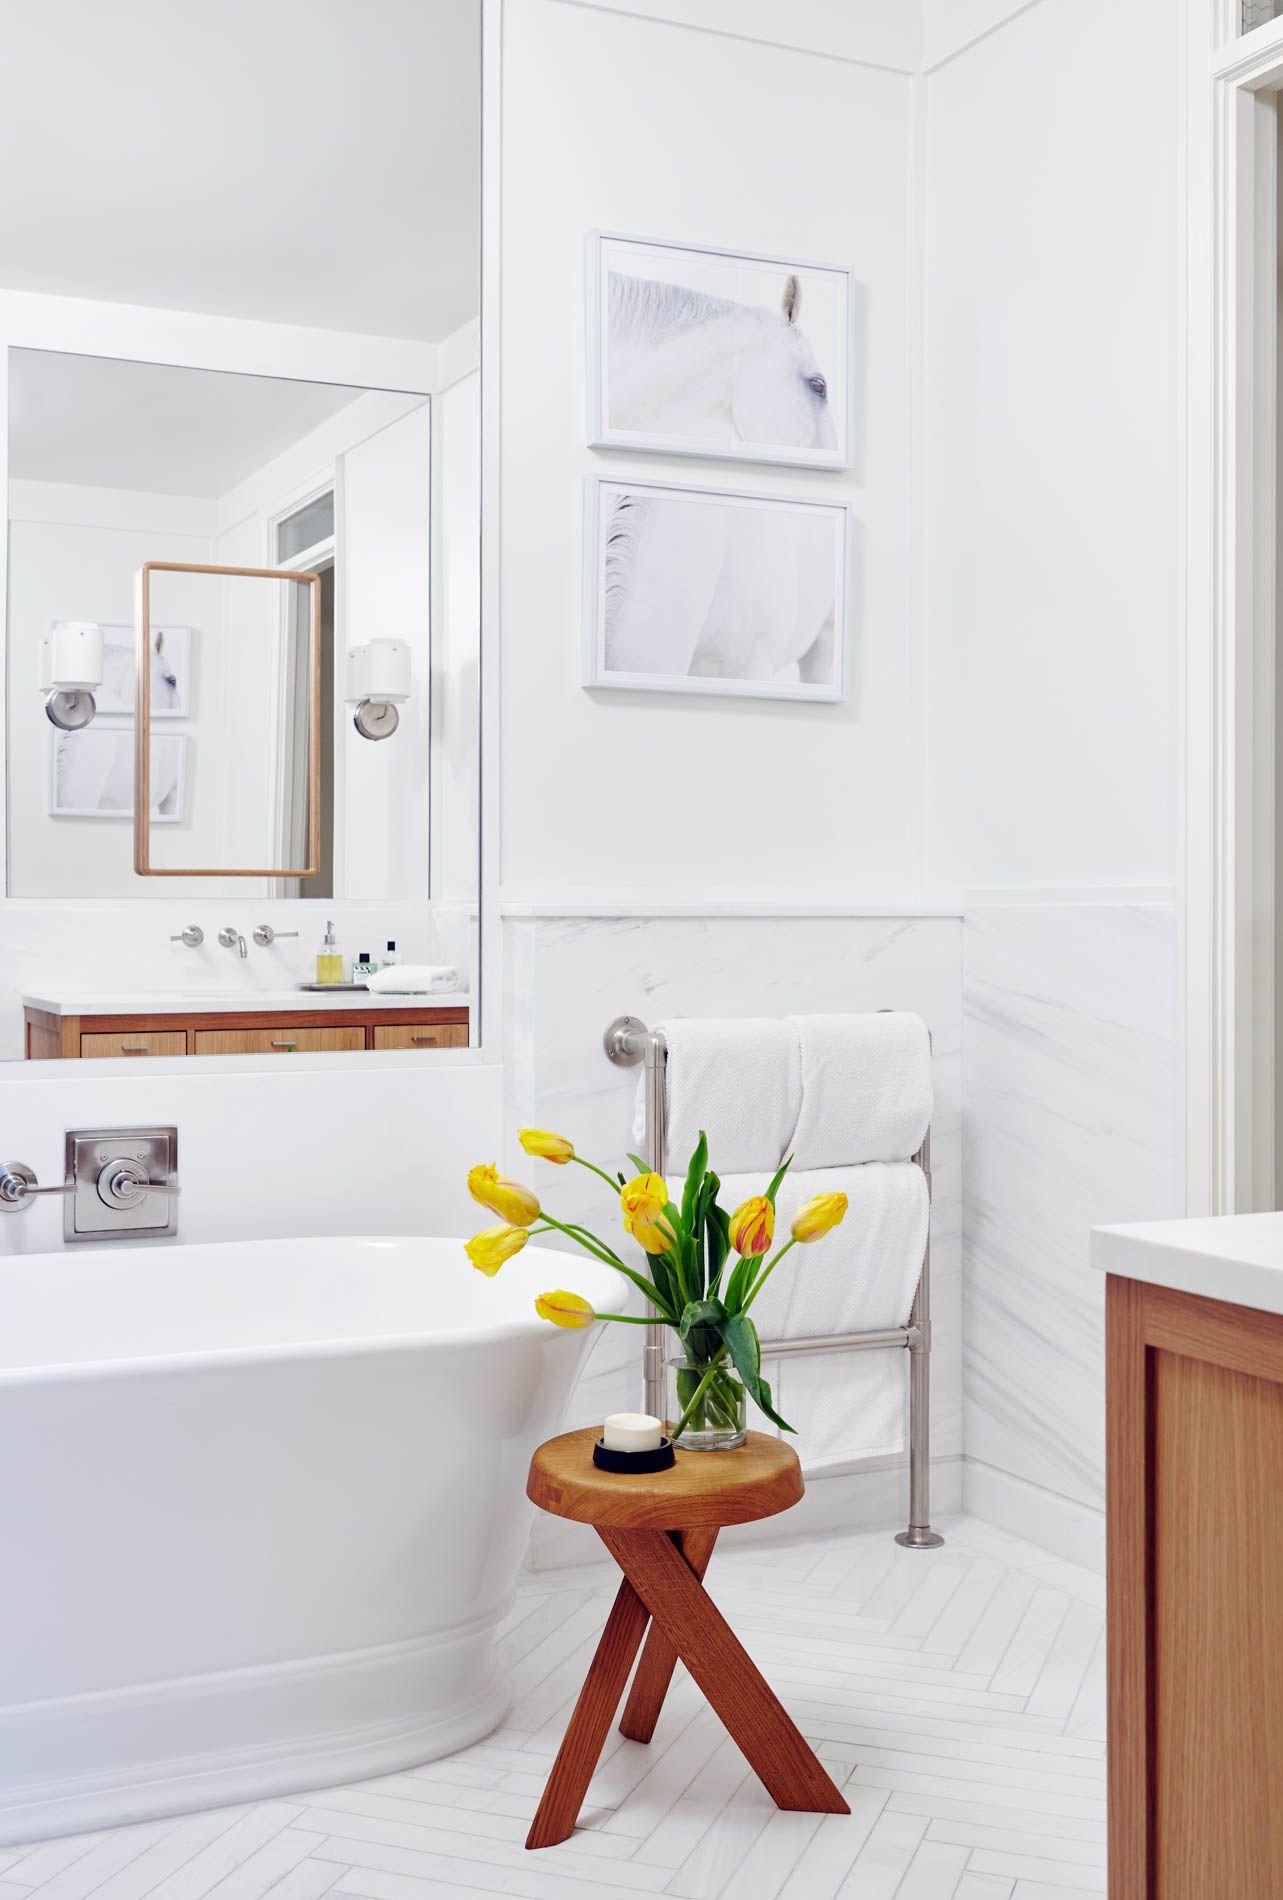 REID ROLLS PHOTOGRAPHY | consort laight st | 9 | Bathrooms ...